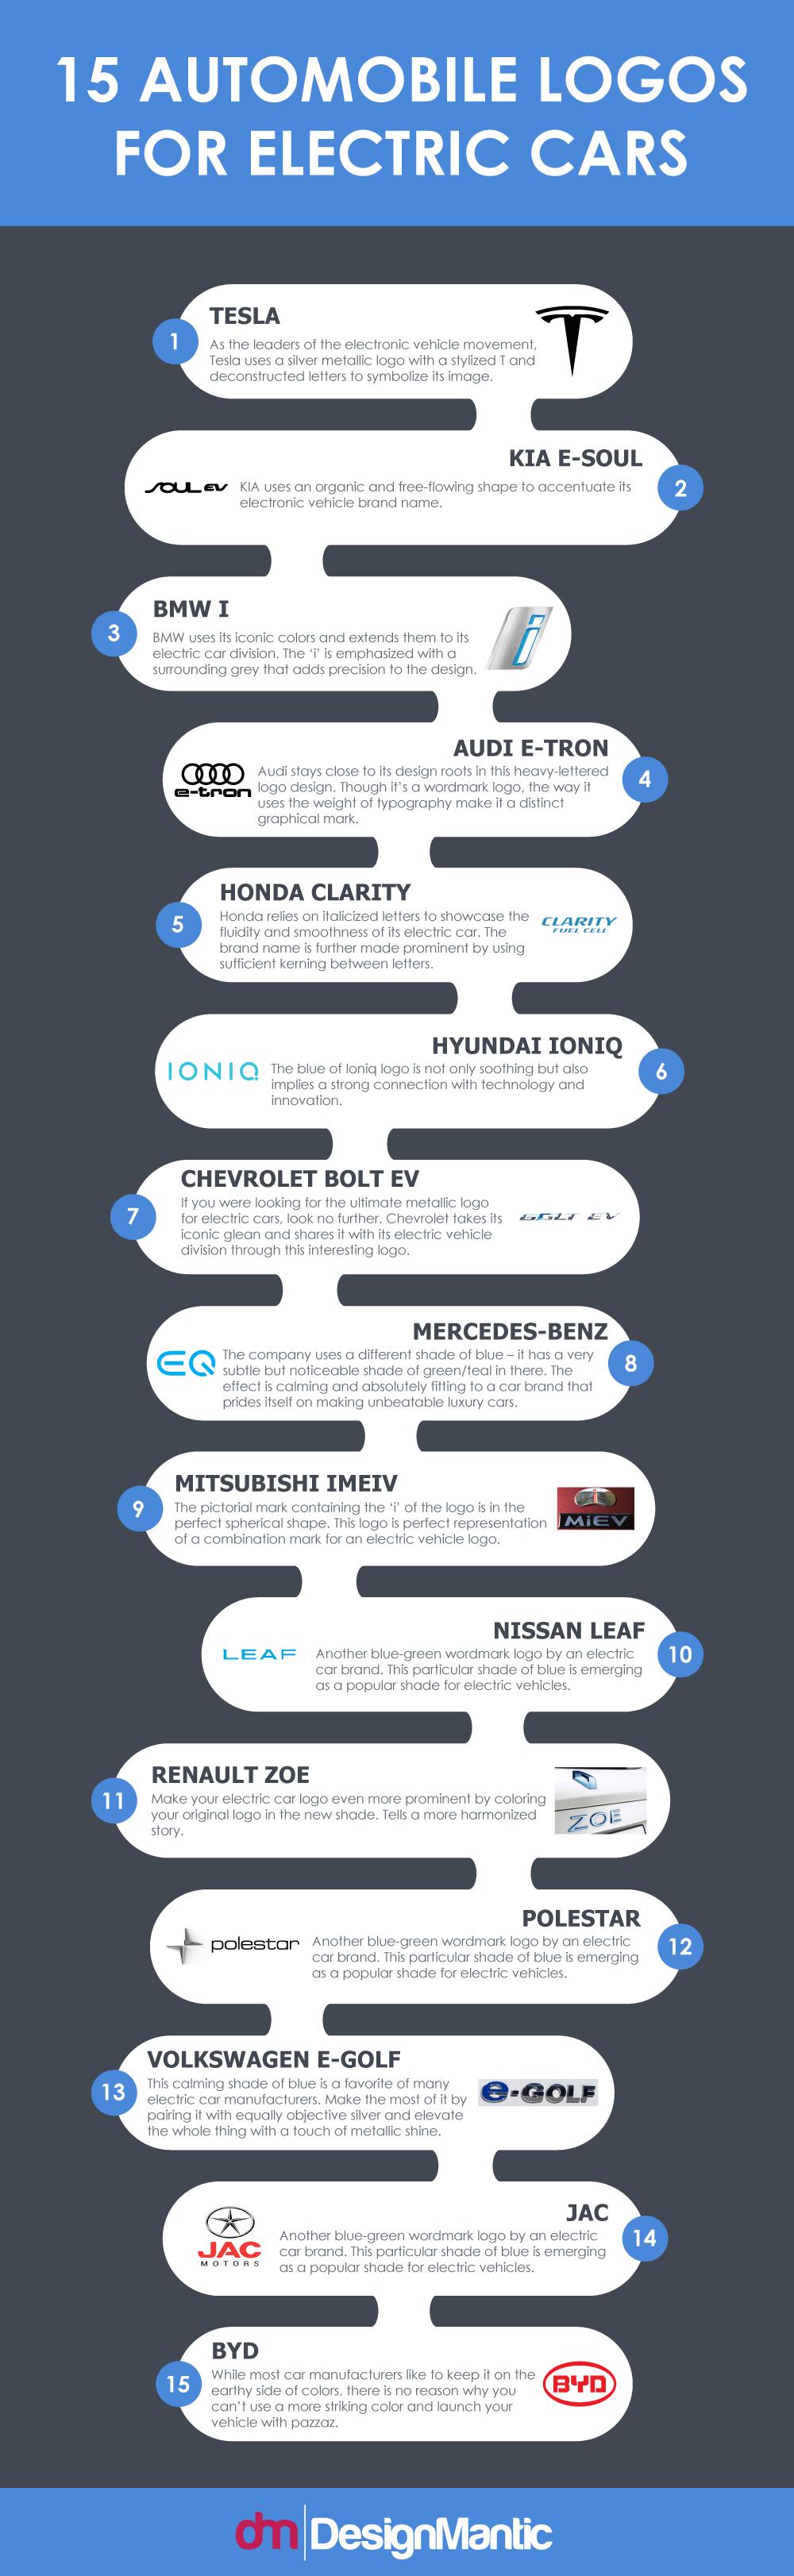 15 Automobile Logos